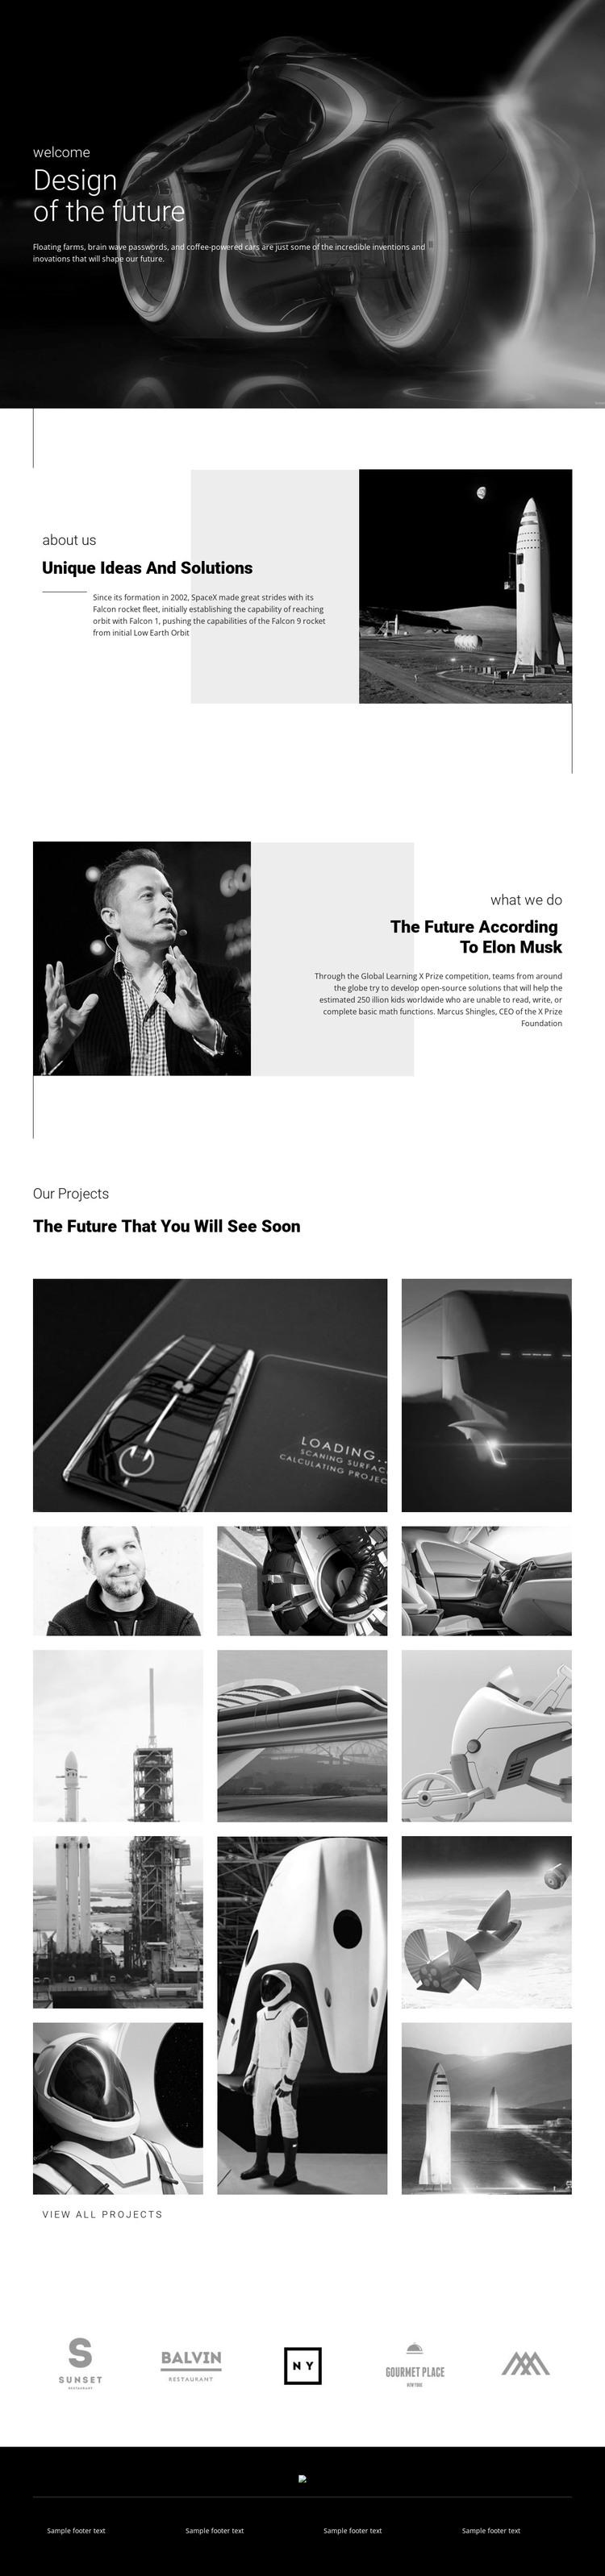 Design of future technology Web Design